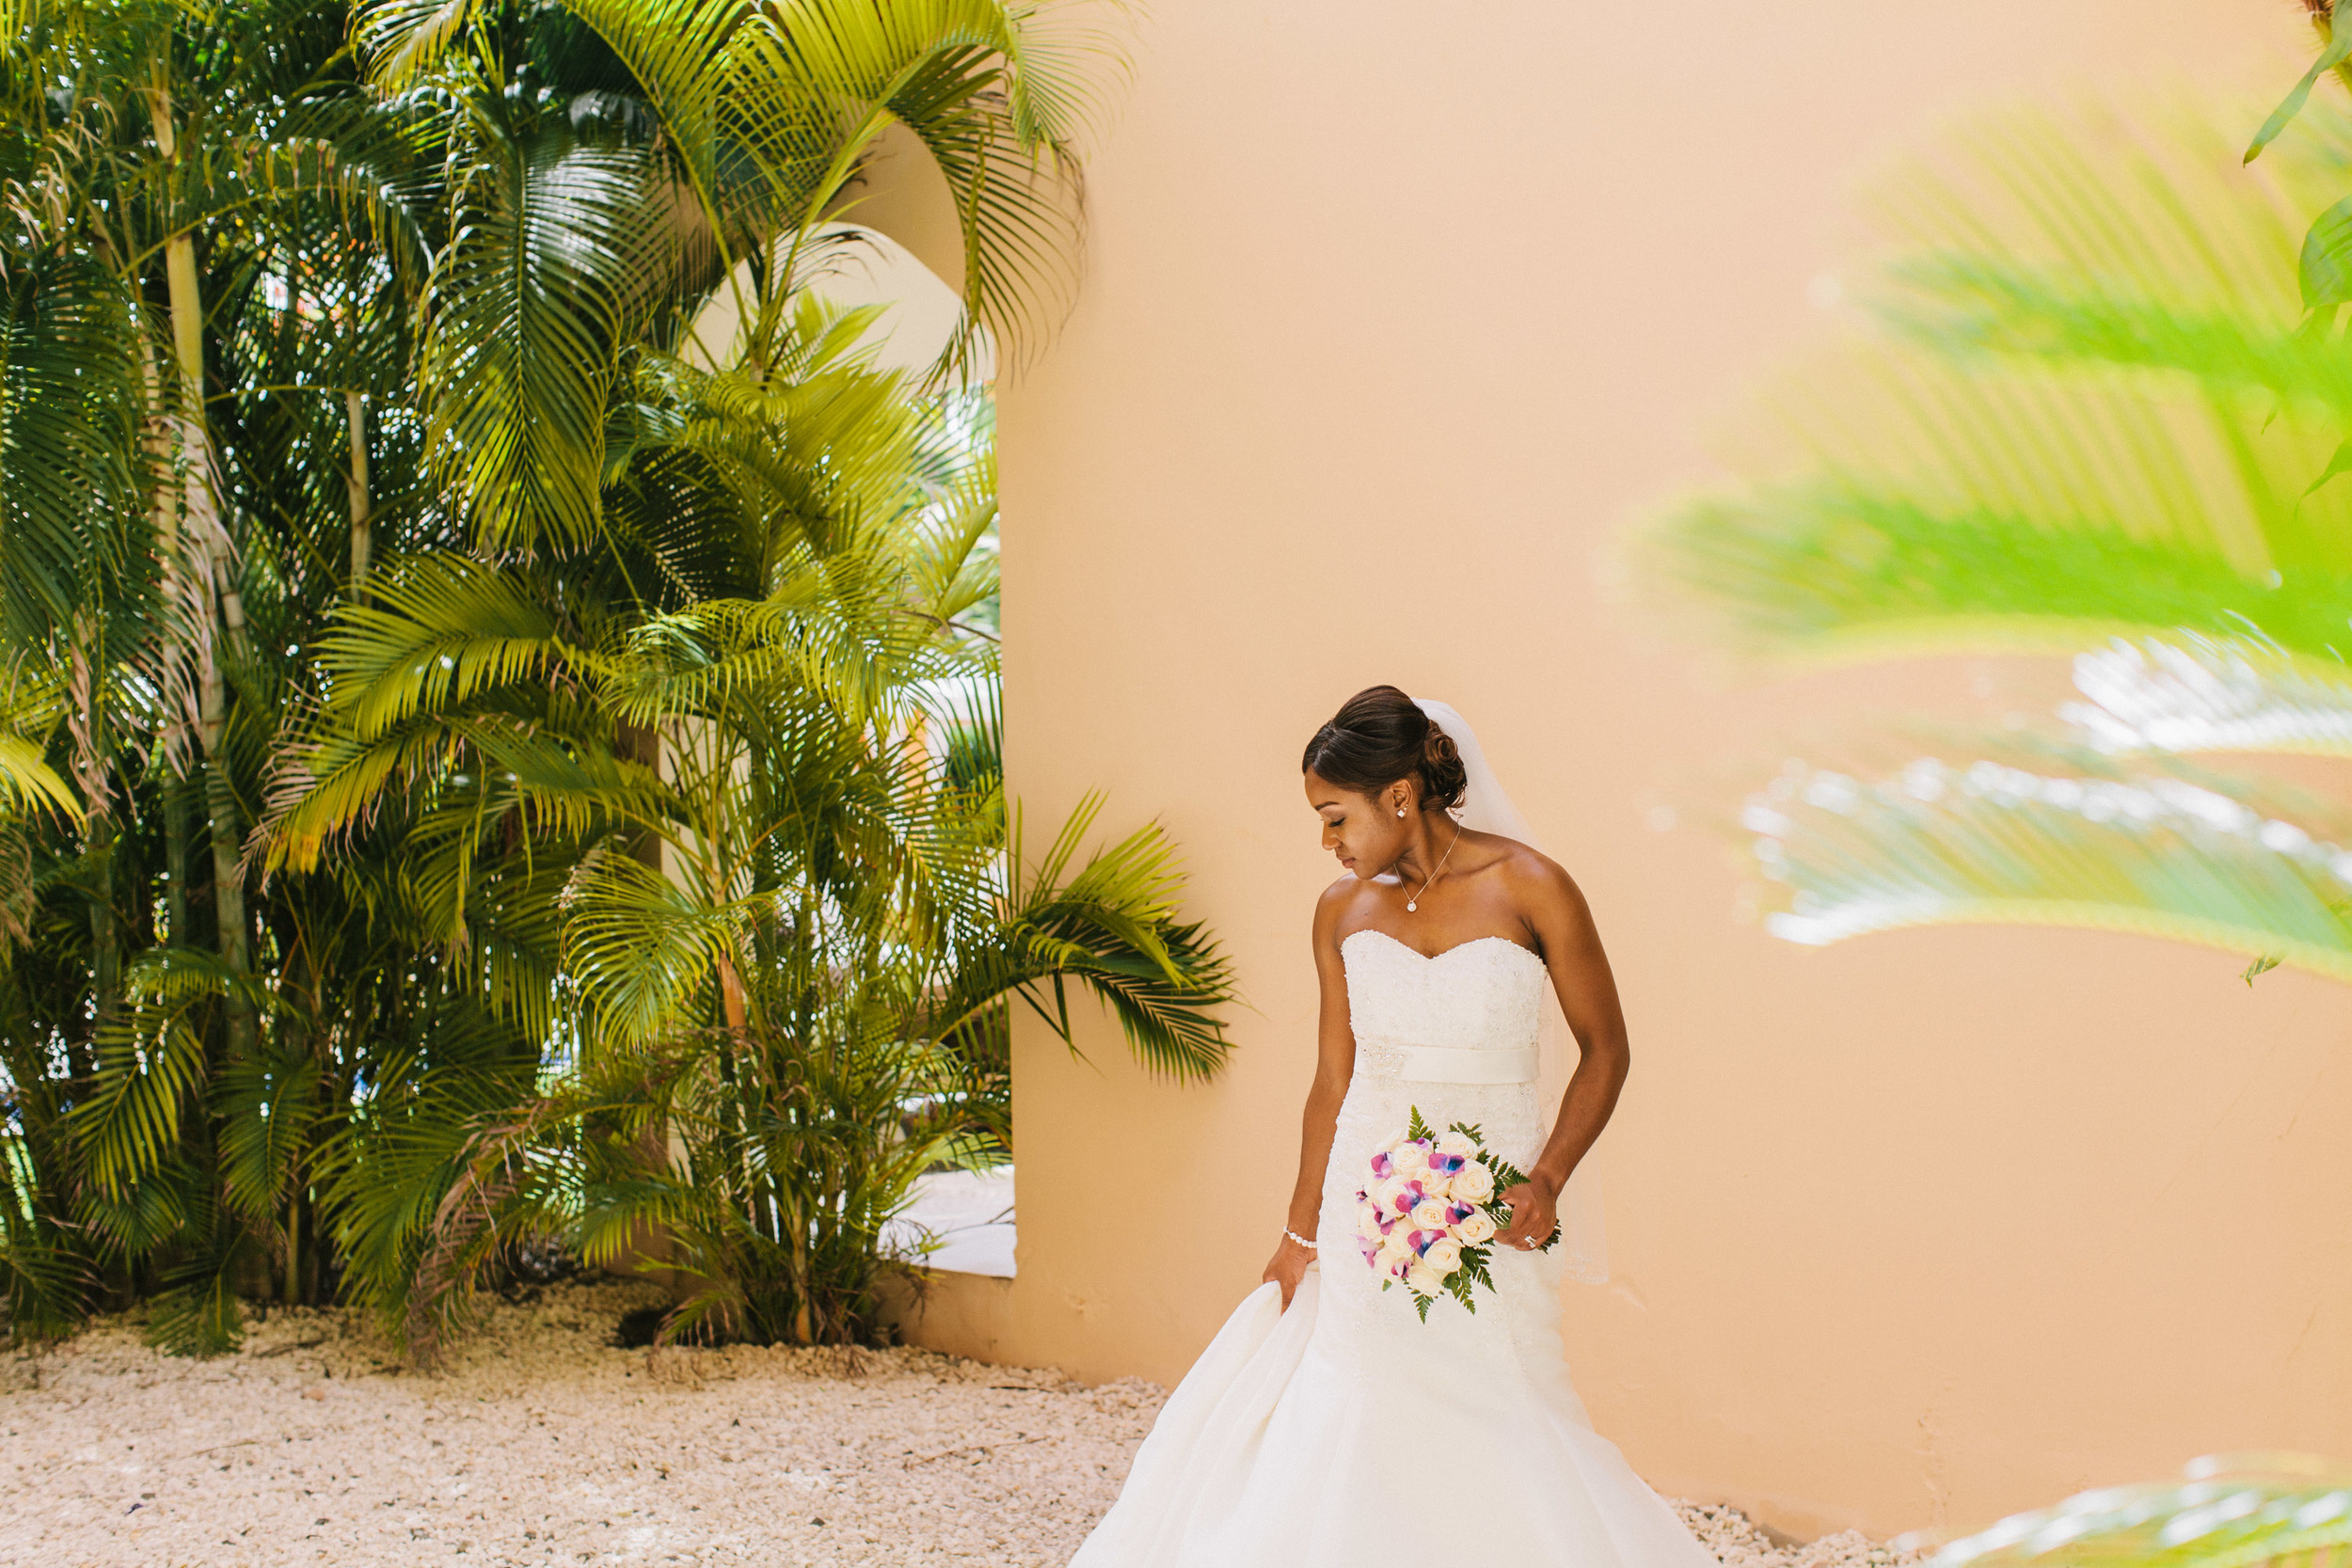 michael-rousseau-photography-dominican-republic-destination-wedding-cara-jason-colonial-majestic-dominican-republic085.jpg